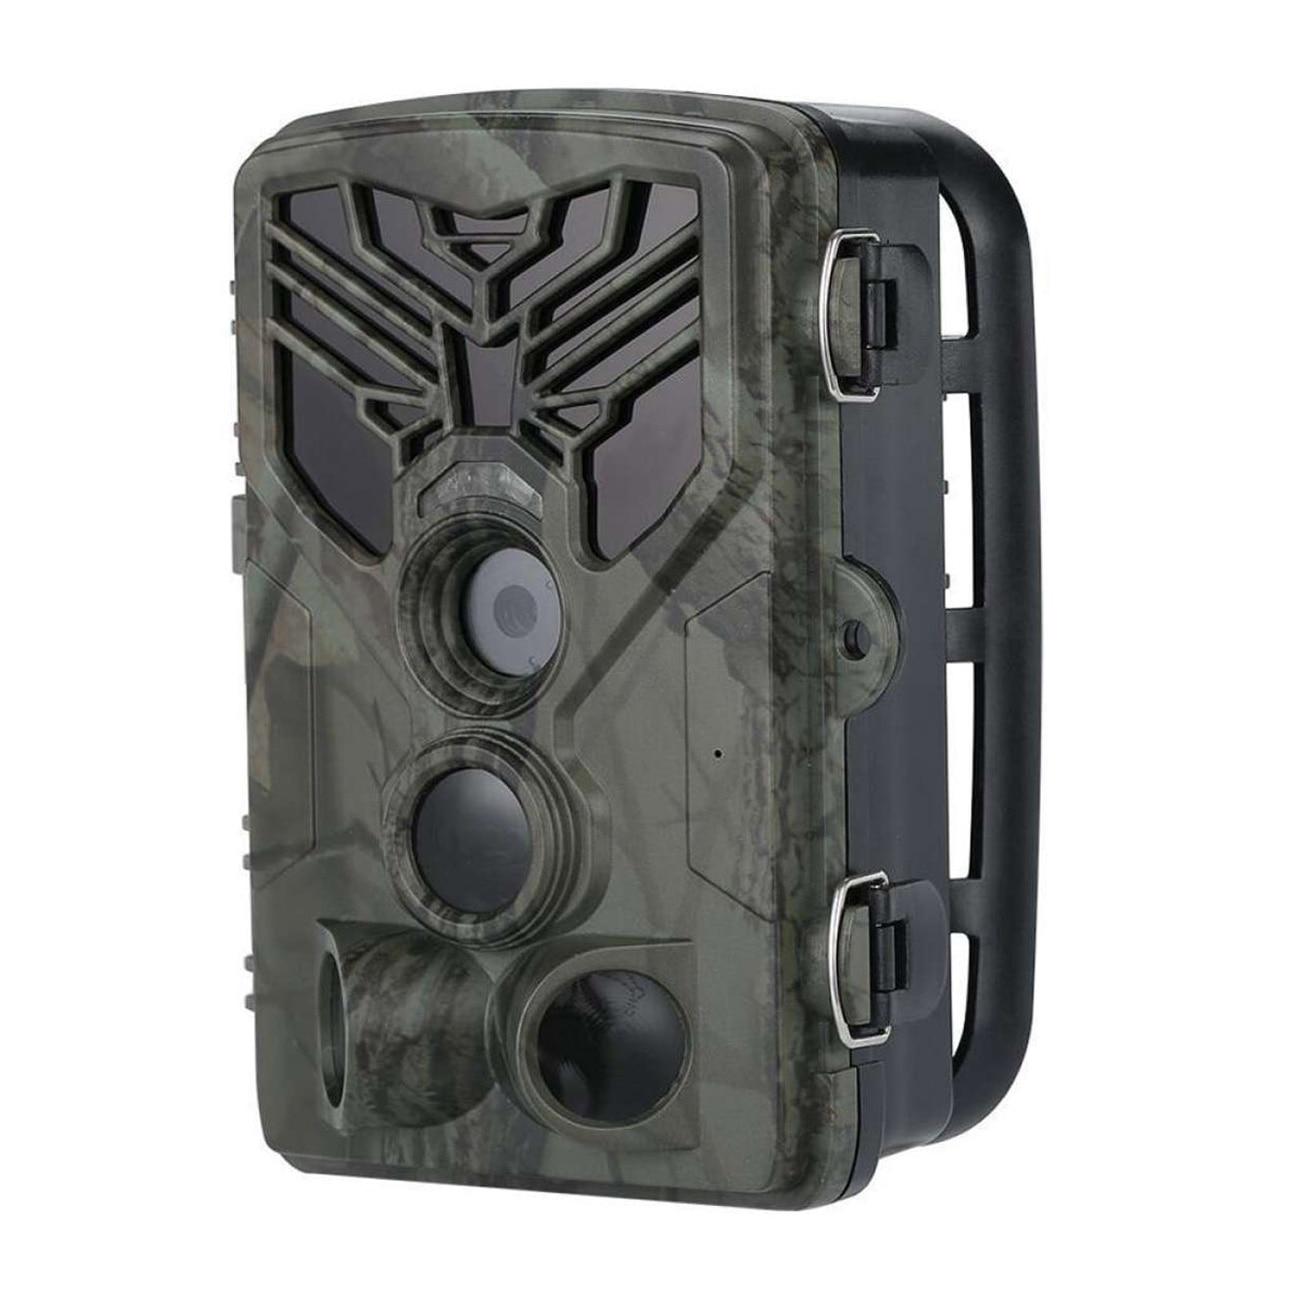 HC-810A 1080P 20MP HD الصيد الحياة البرية كاميرا درب الكشفية كاميرا Wildview 3 PIR الحركة للرؤية الليلية كاميرا المنزل آمنة كاميرا